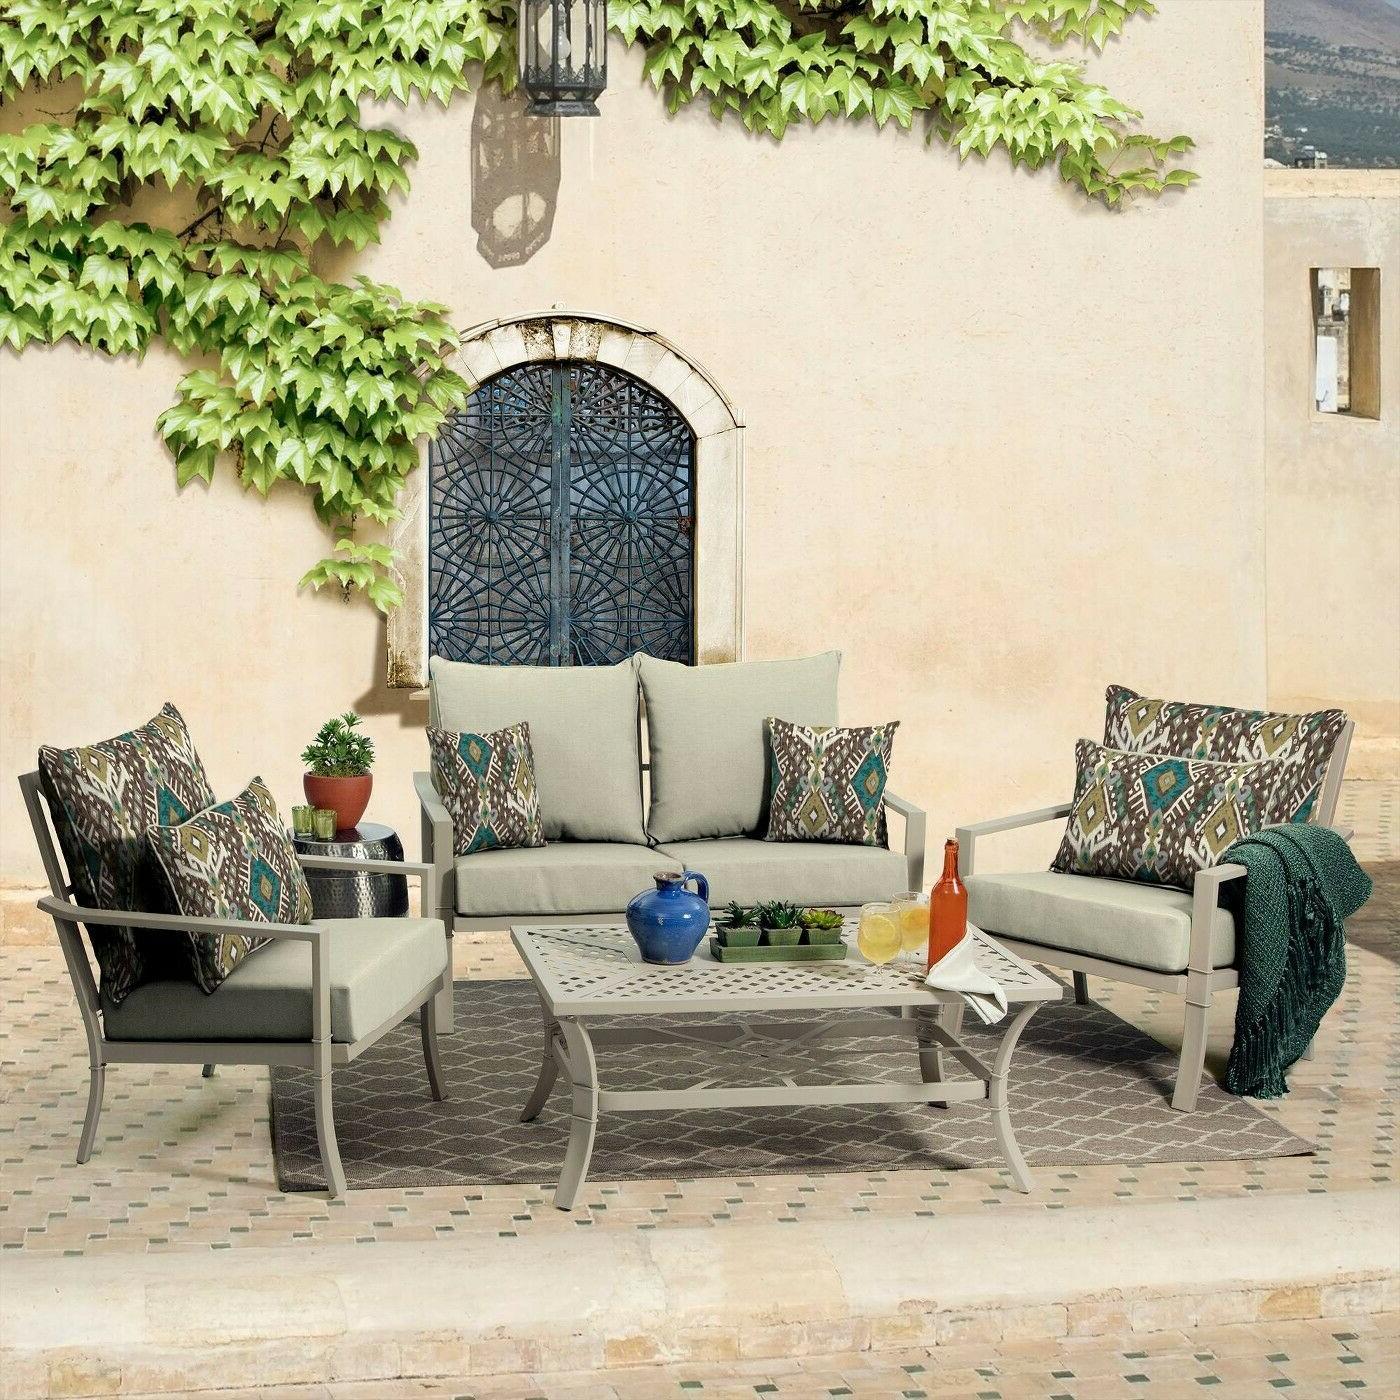 Outdoor Seat Patio Set Pad Resistant Furniture